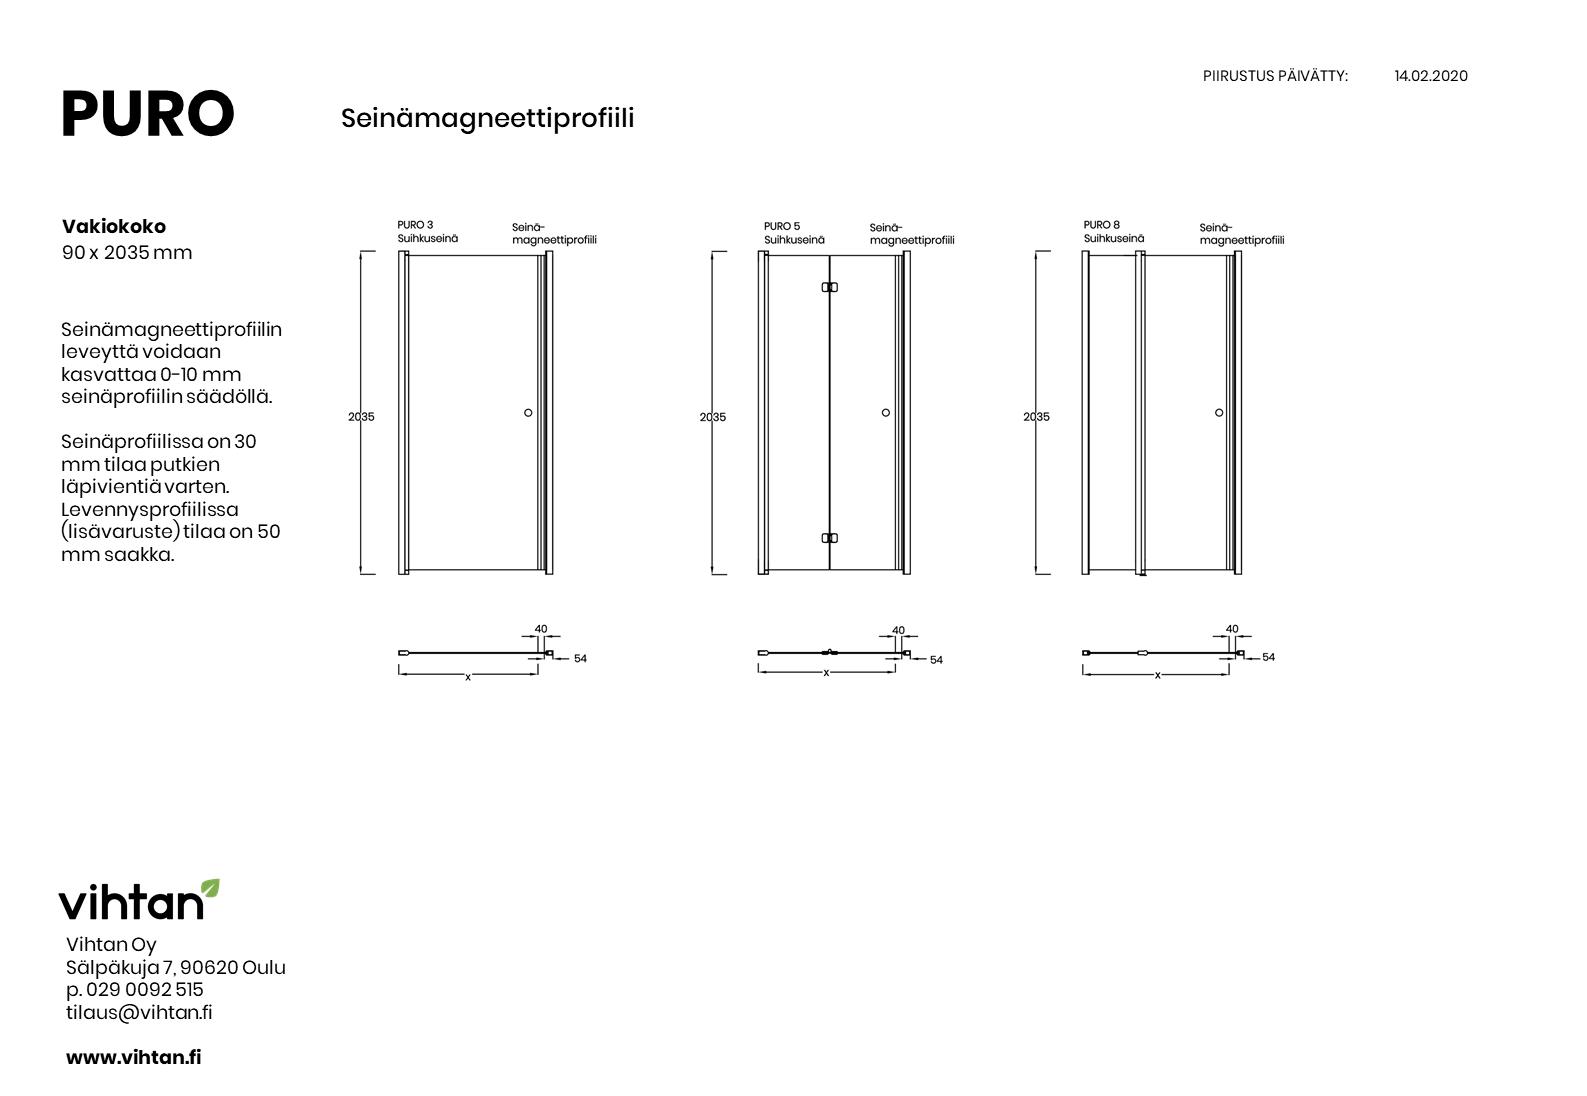 mittakuva PURO seinämagneettiprofiili